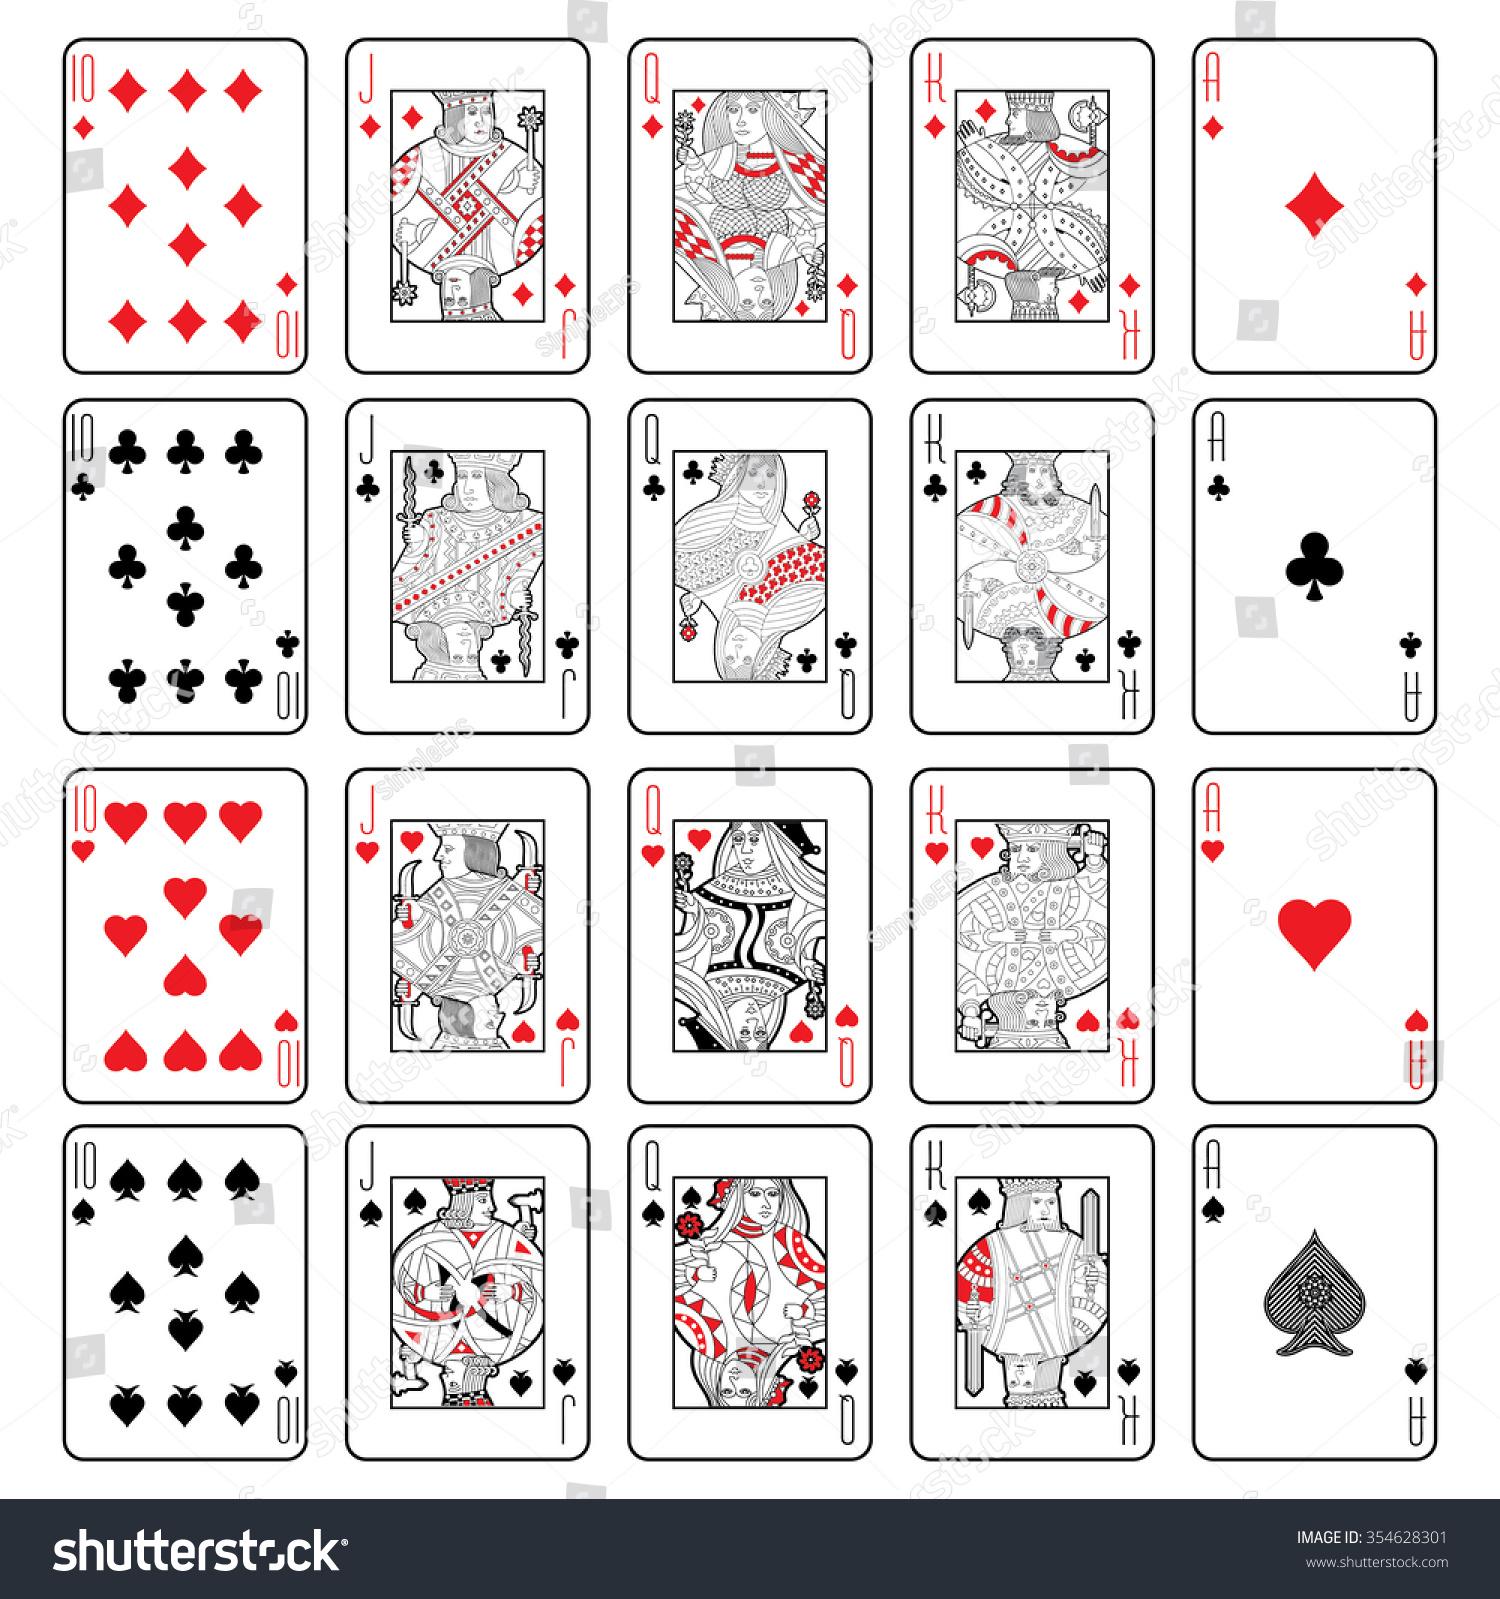 Blackjack double down hand signal